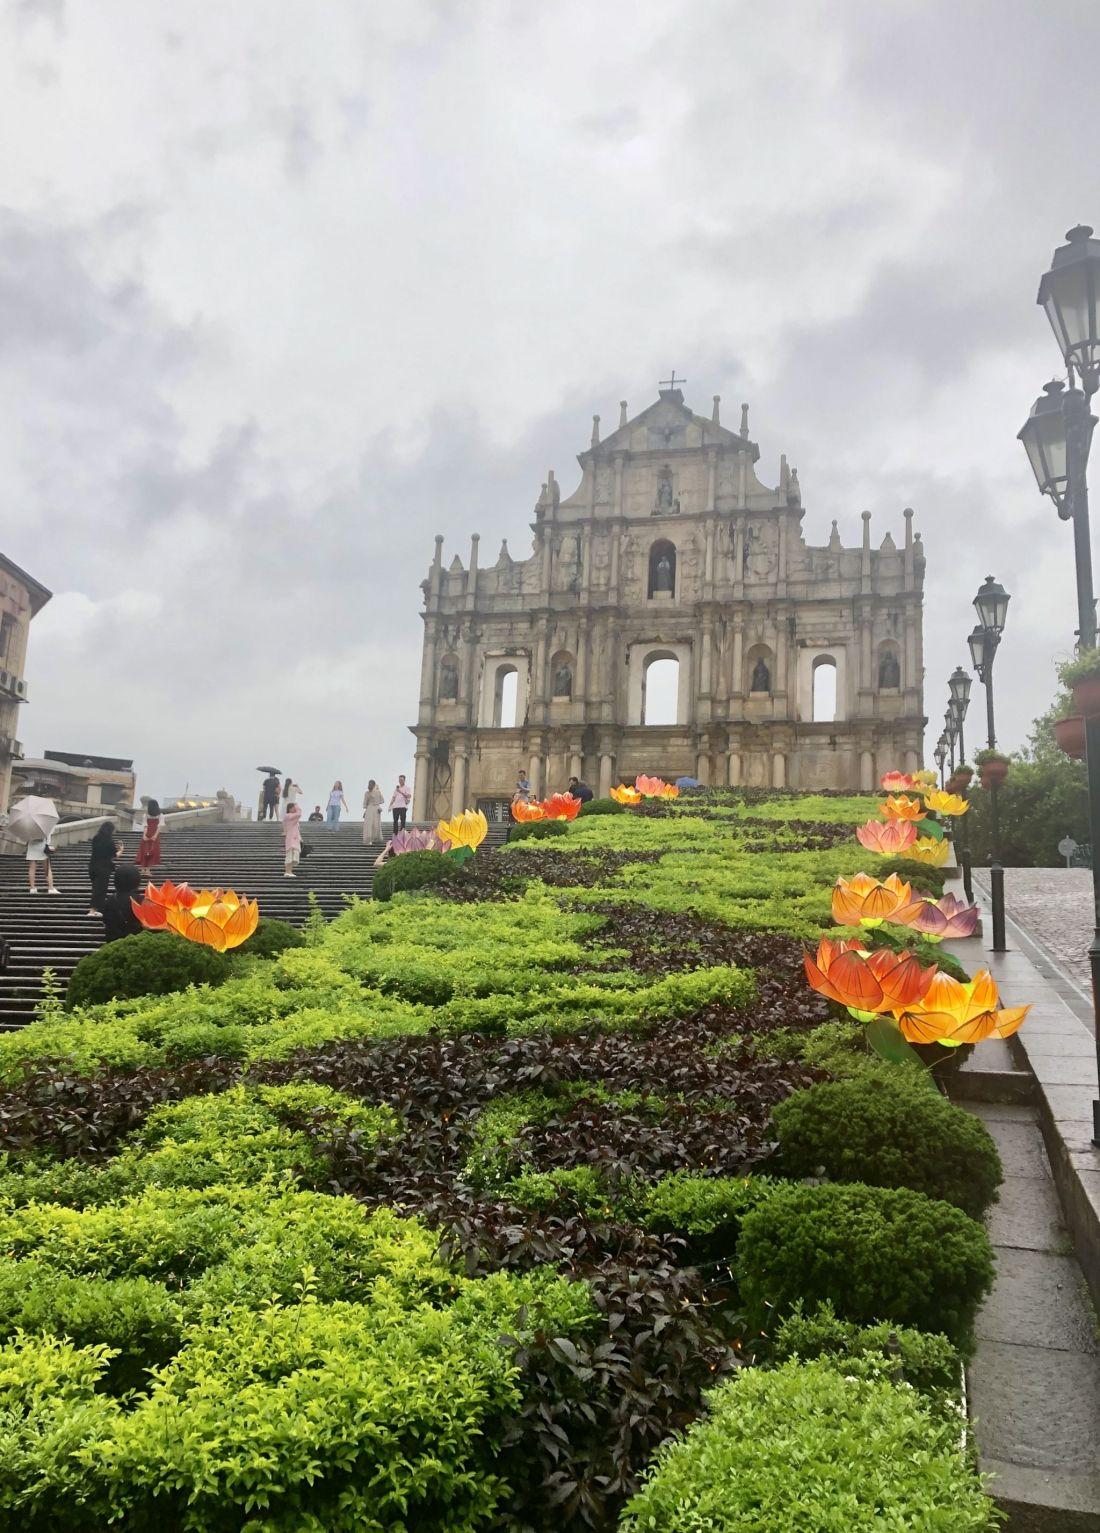 Ruins of St Pauls, Macau